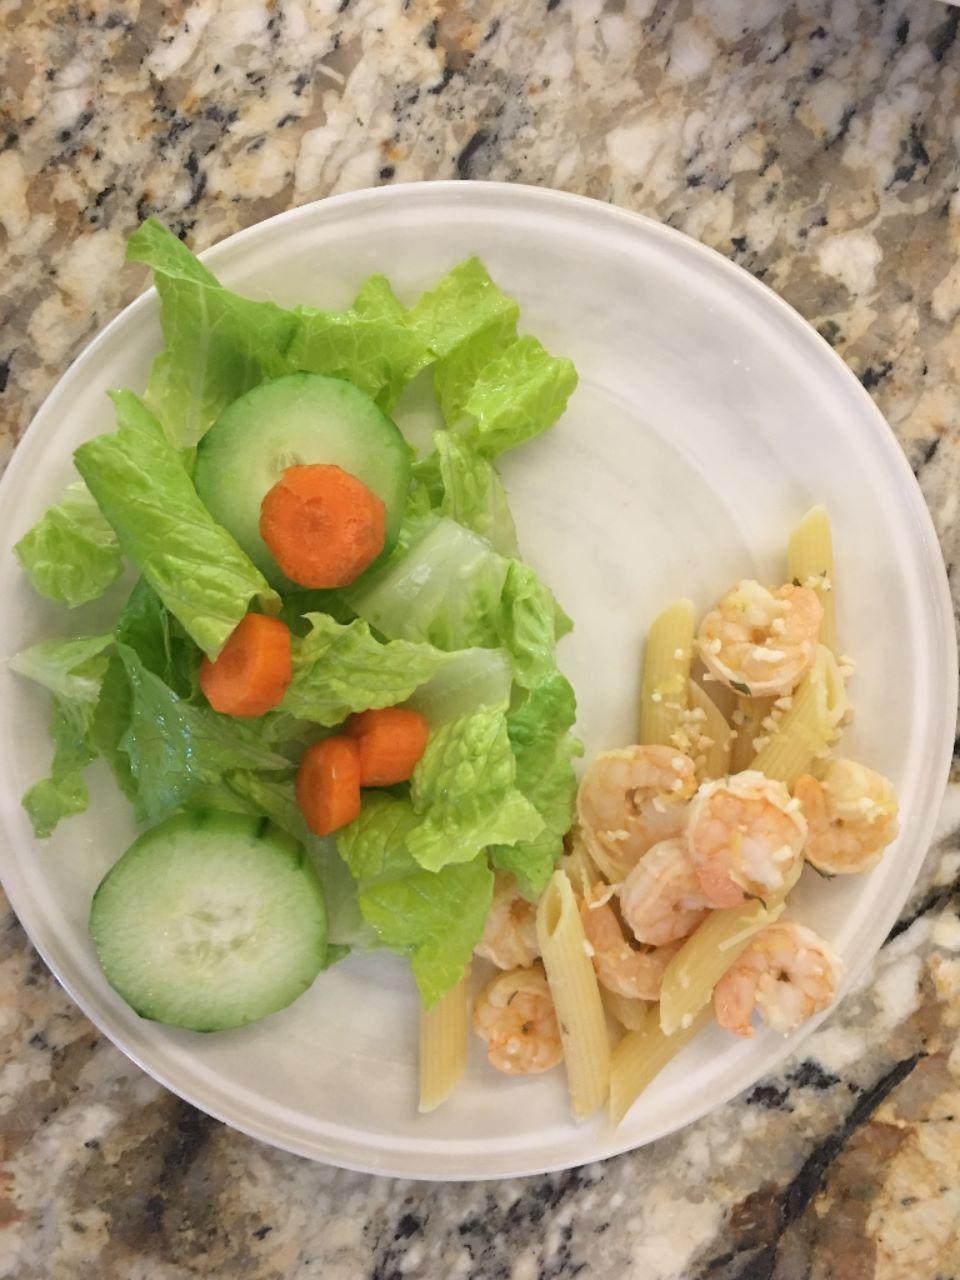 Lemon and Garlic Shrimp image